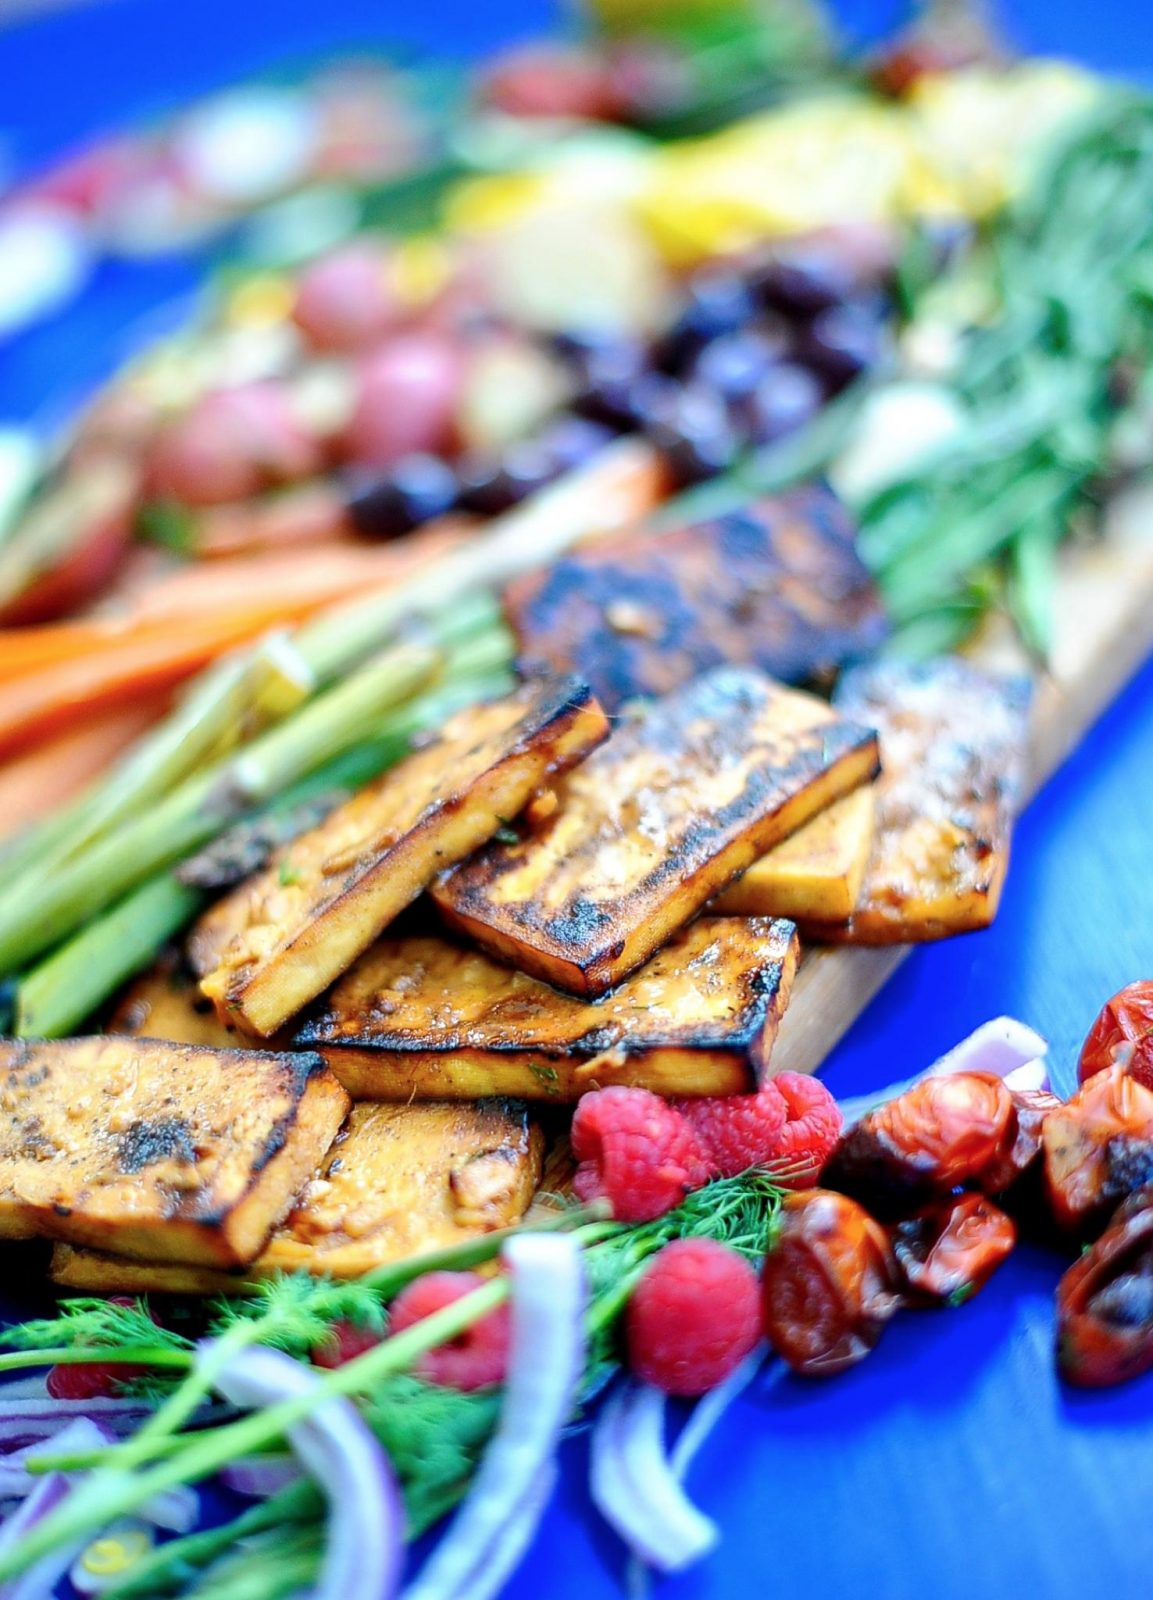 Vegan Nicoise Salad with Grilled Orange Tofu